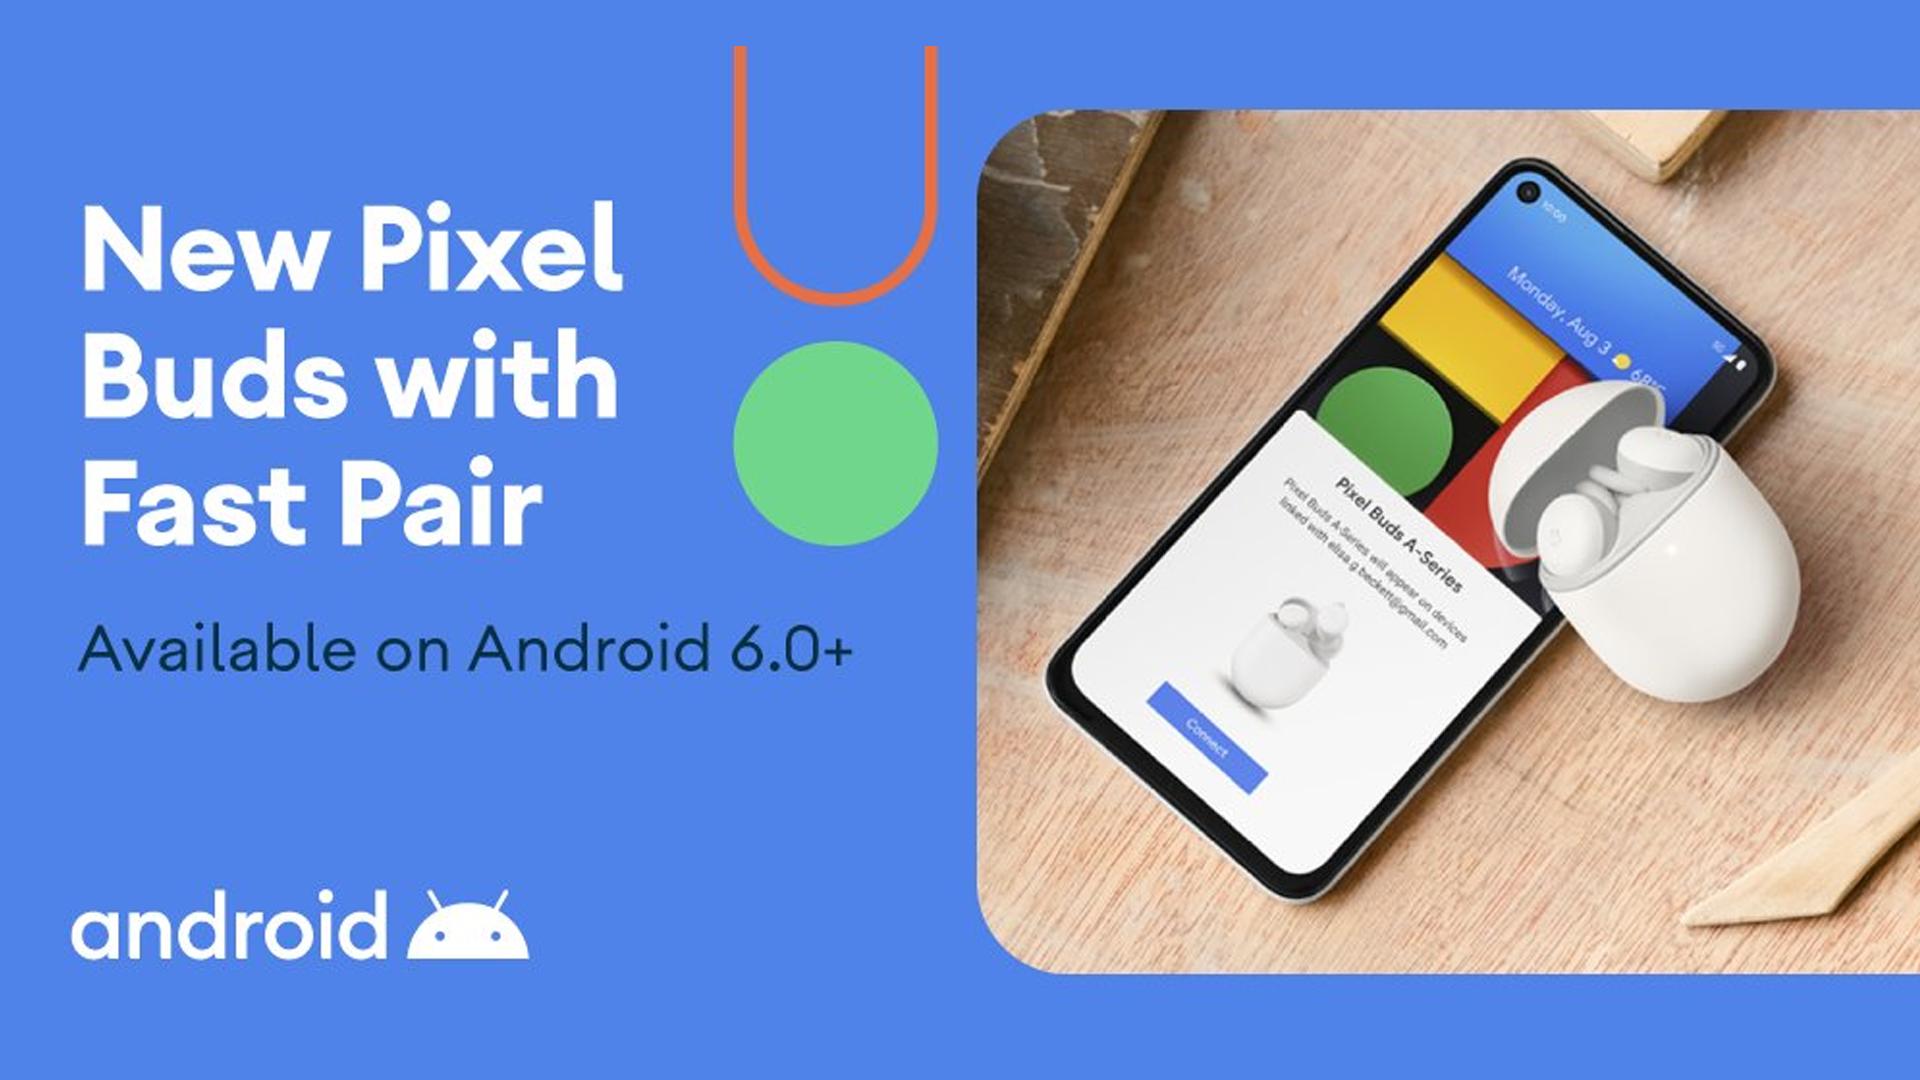 Google Pixel Buds A-Series Fast Pair